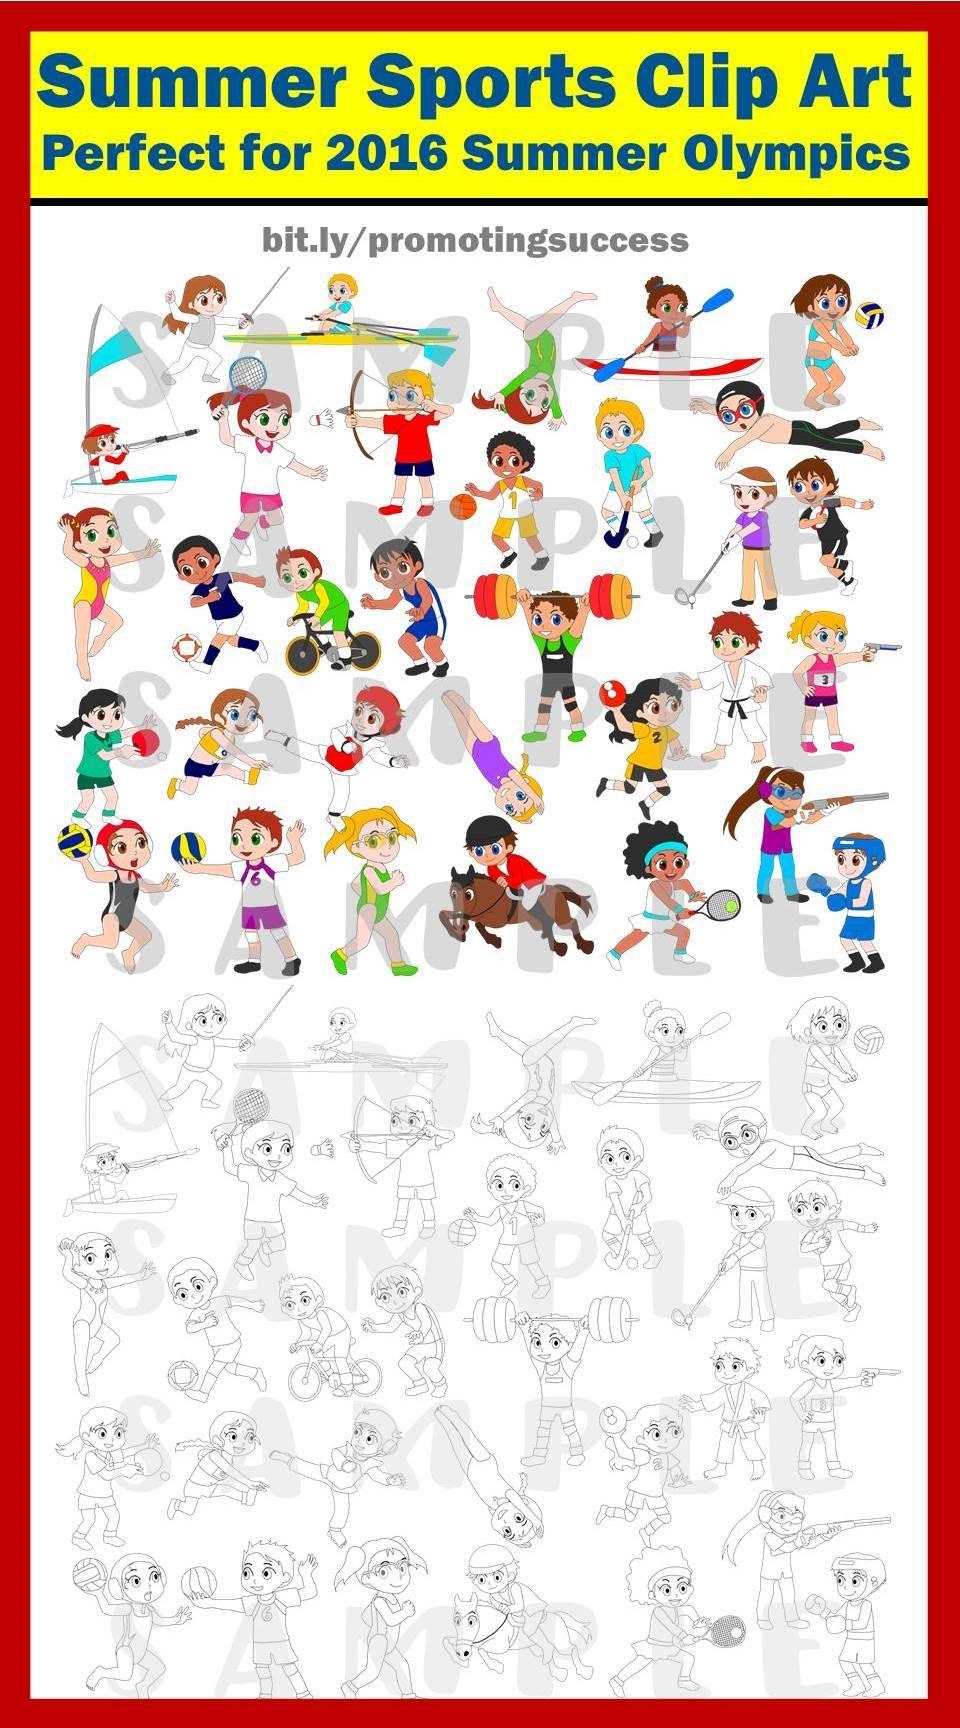 Summer Sports Clip Art | Kids olympics, Clip art, Olympic idea